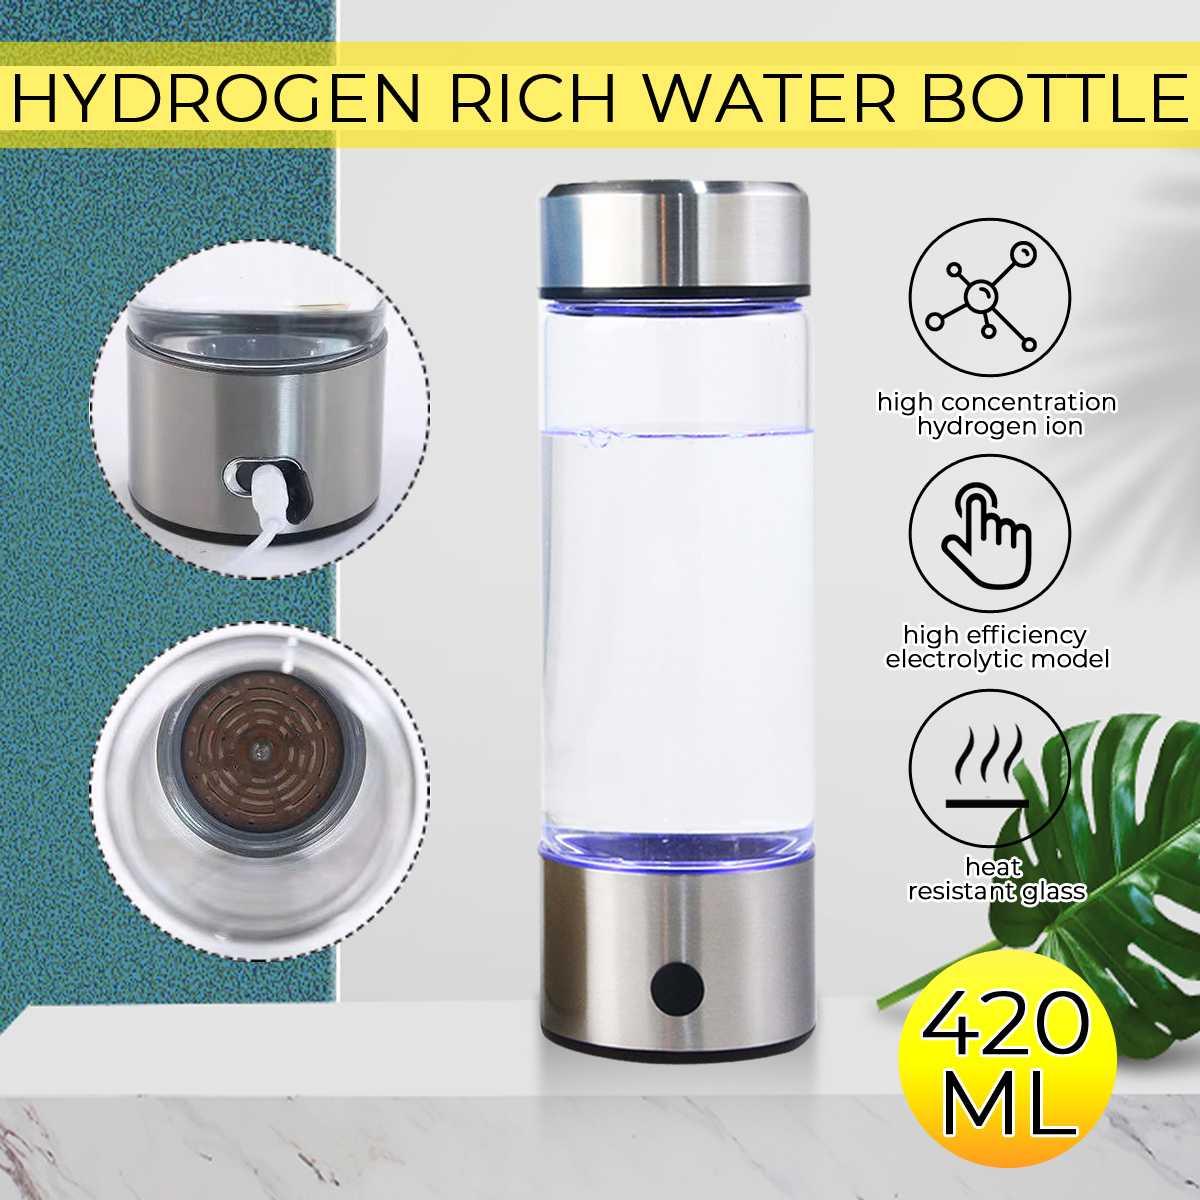 420ML Portable Hydrogens Water Generator Alkaline Maker USB Rechargeable For Pure Hydrogen-rich Water Bottle Filter Electrolysis